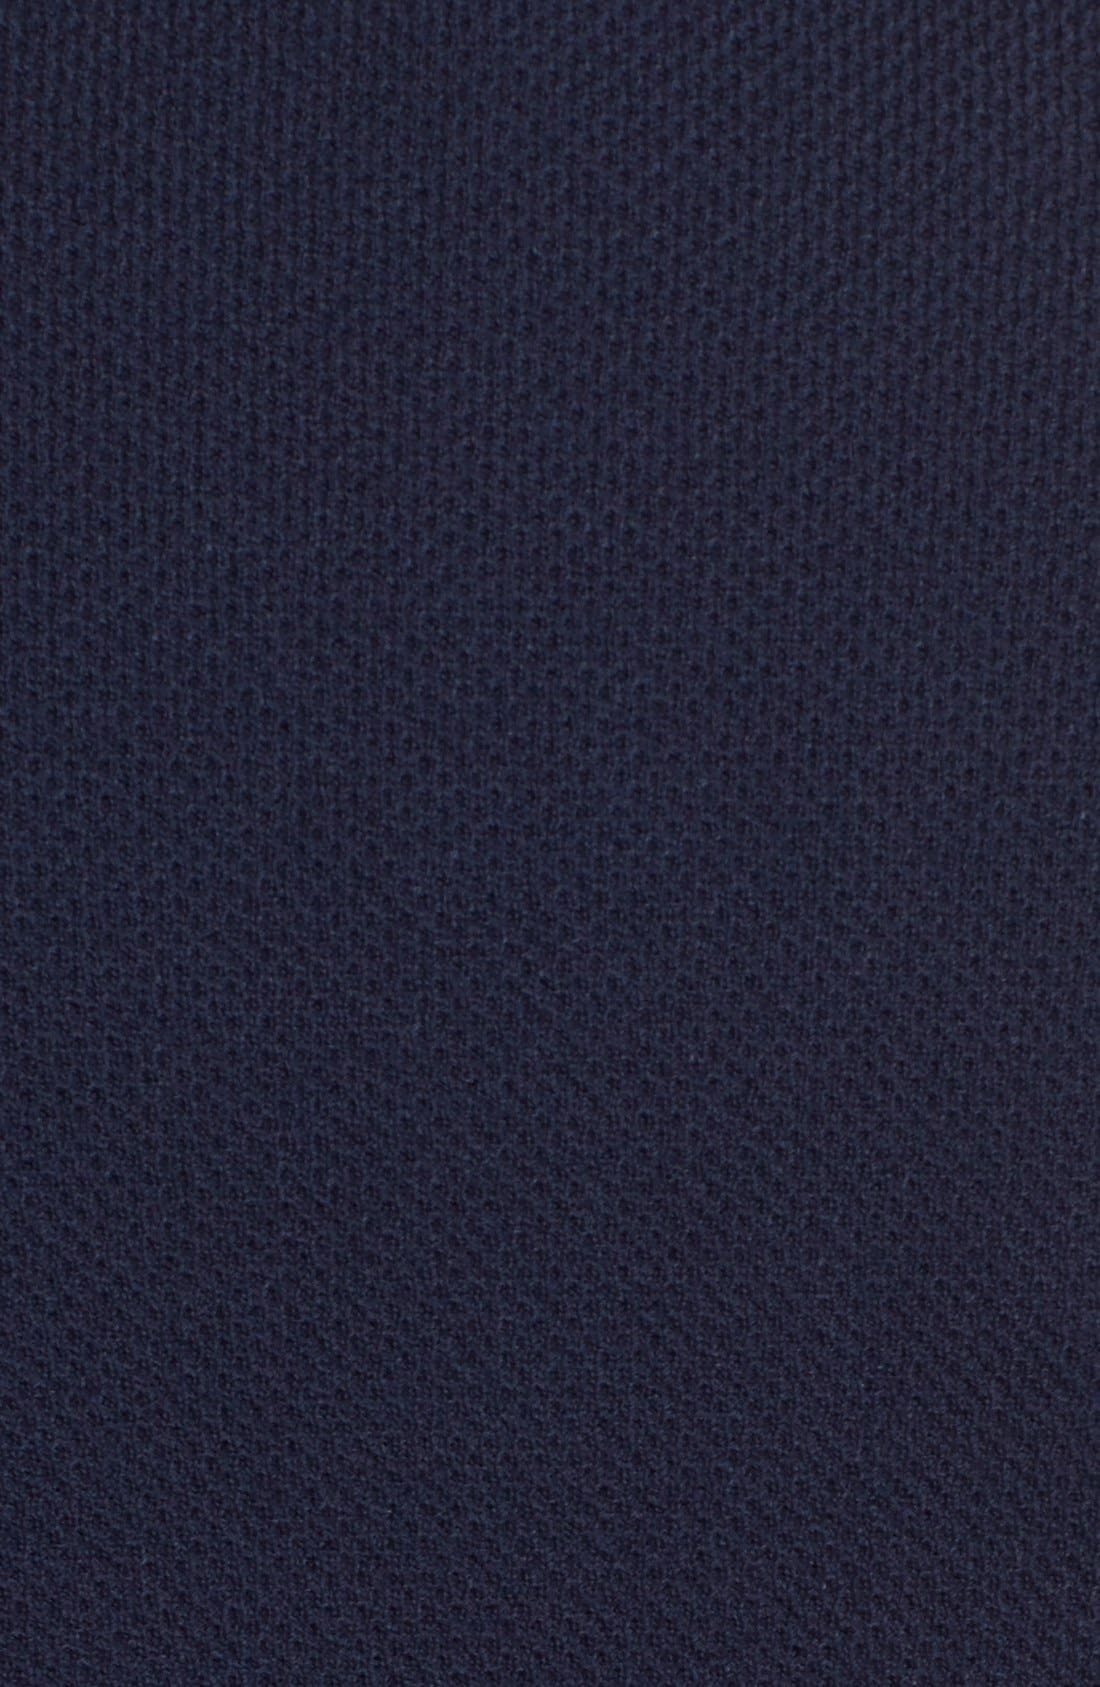 Alternate Image 3  - St. John Collection Piqué MilanoKnit Topper